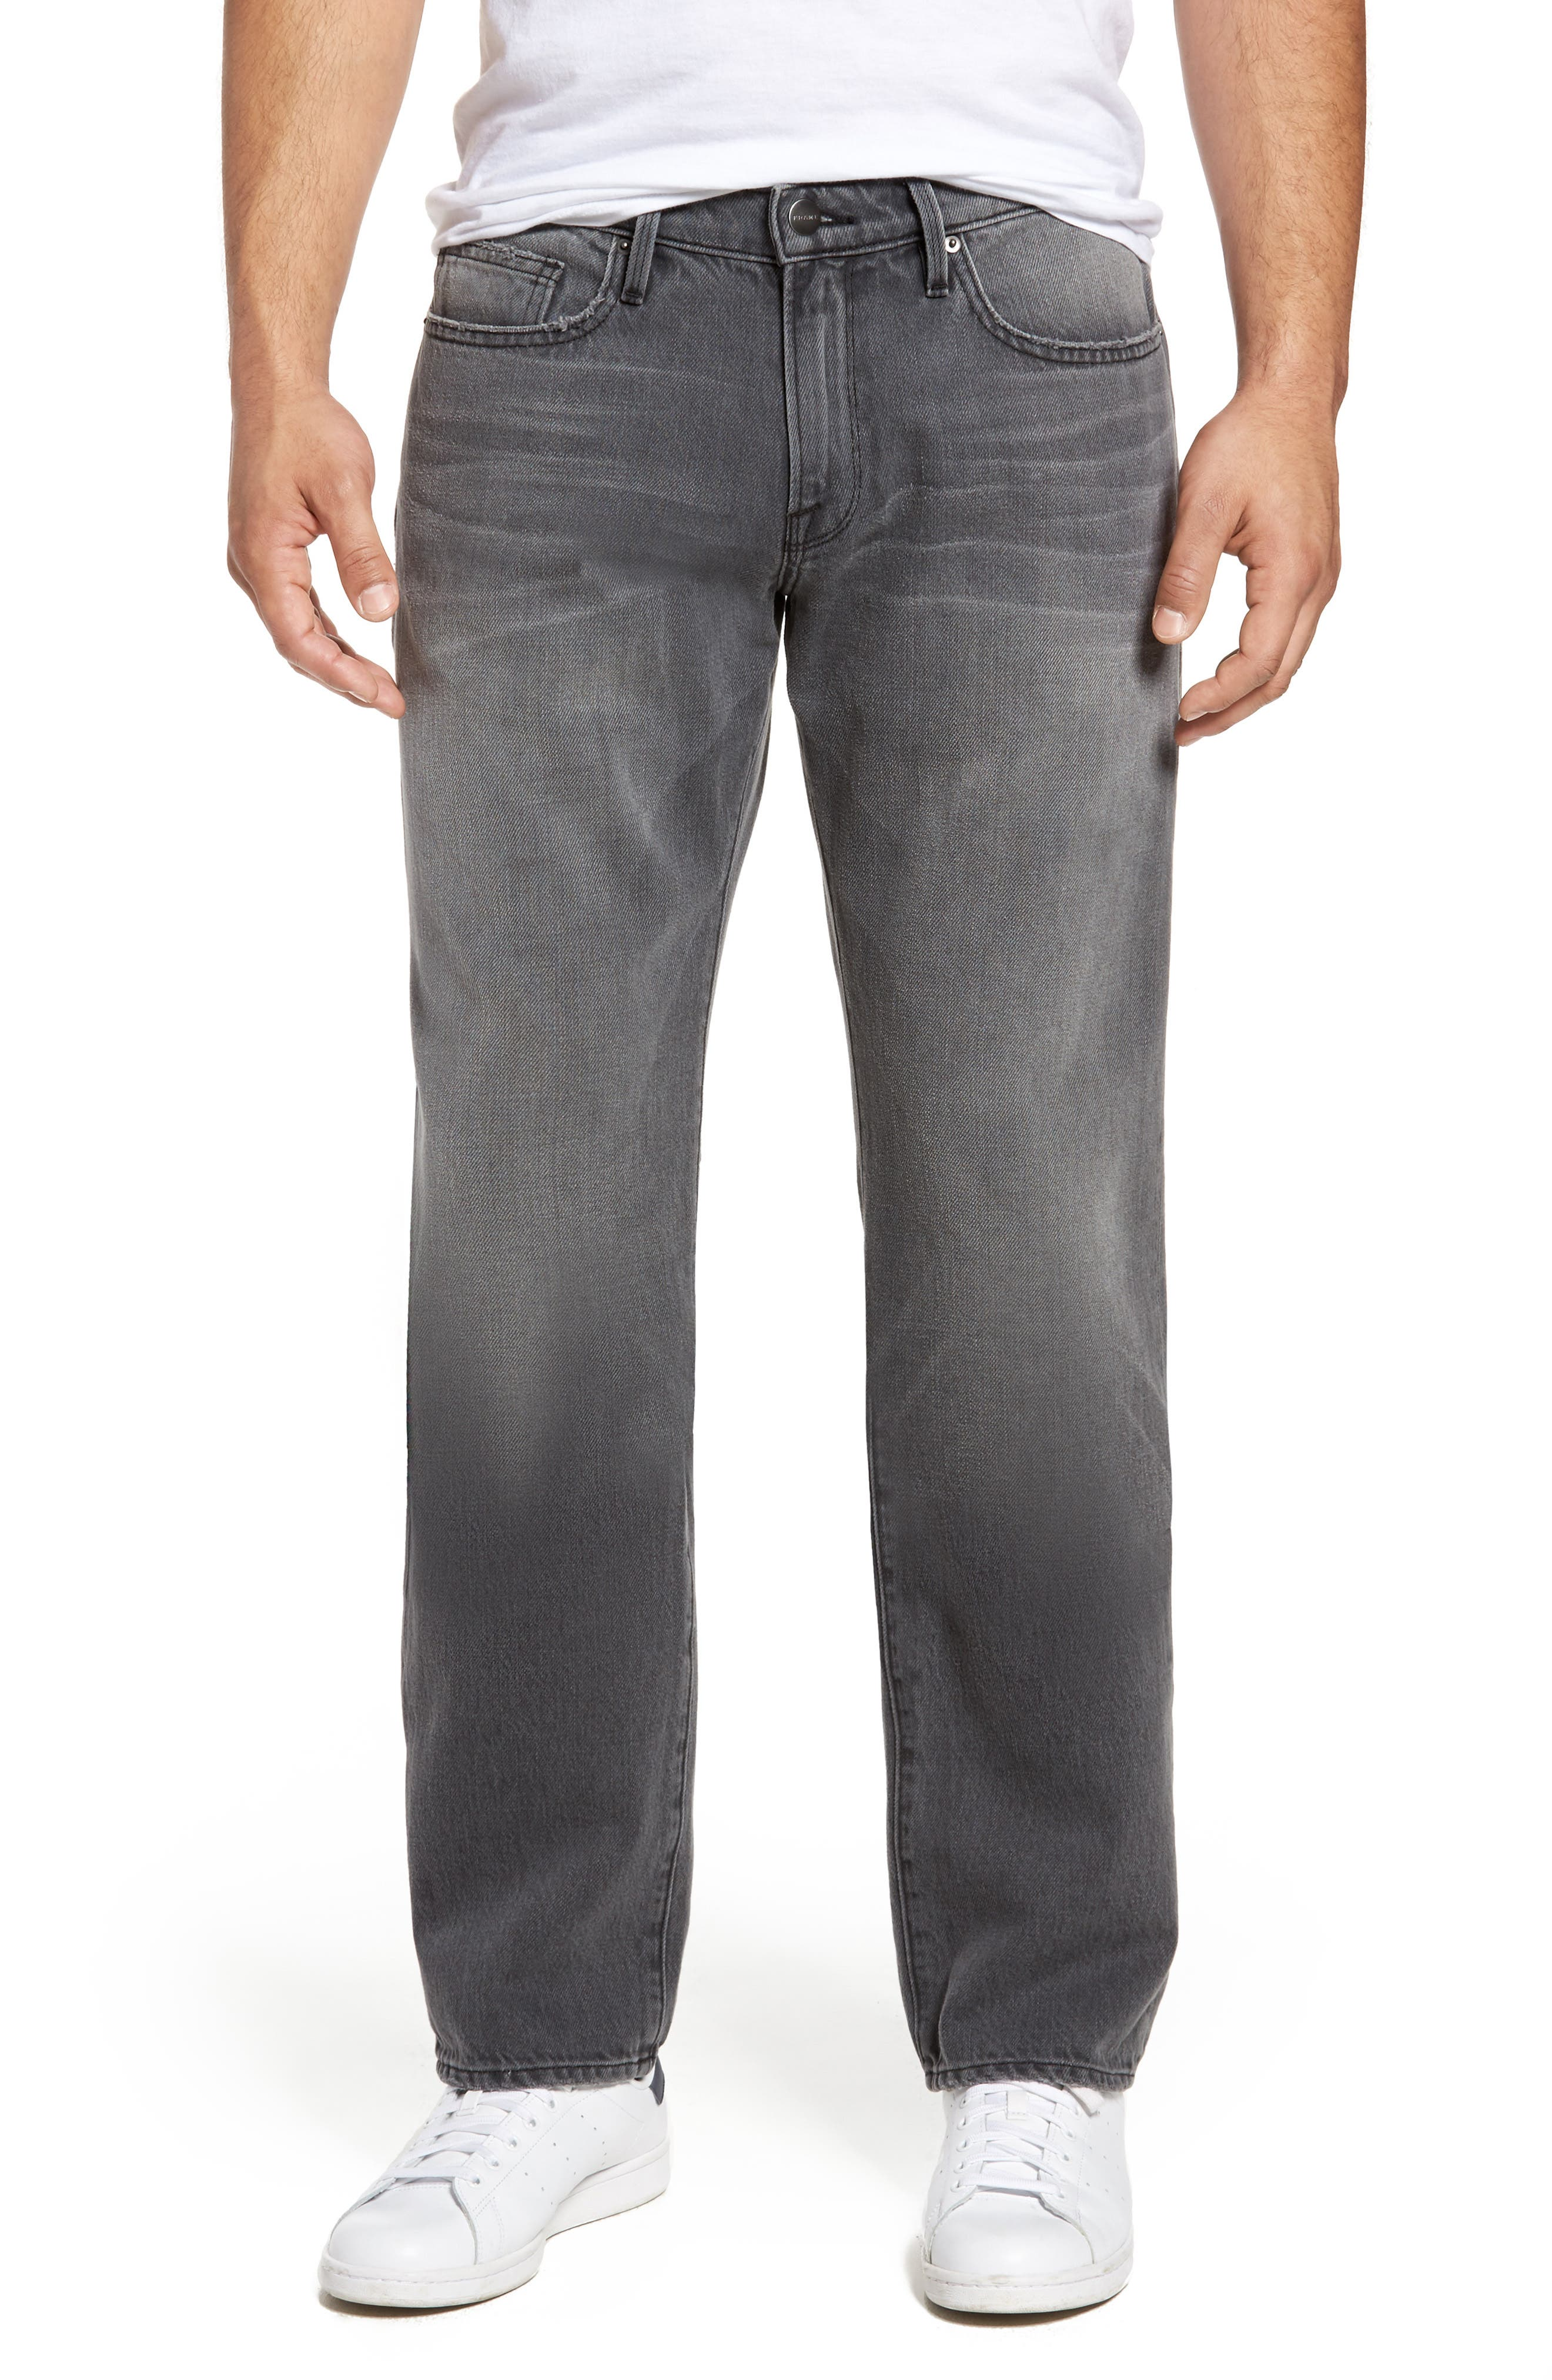 L'Homme Slim Straight Leg Jeans,                         Main,                         color, Commodore